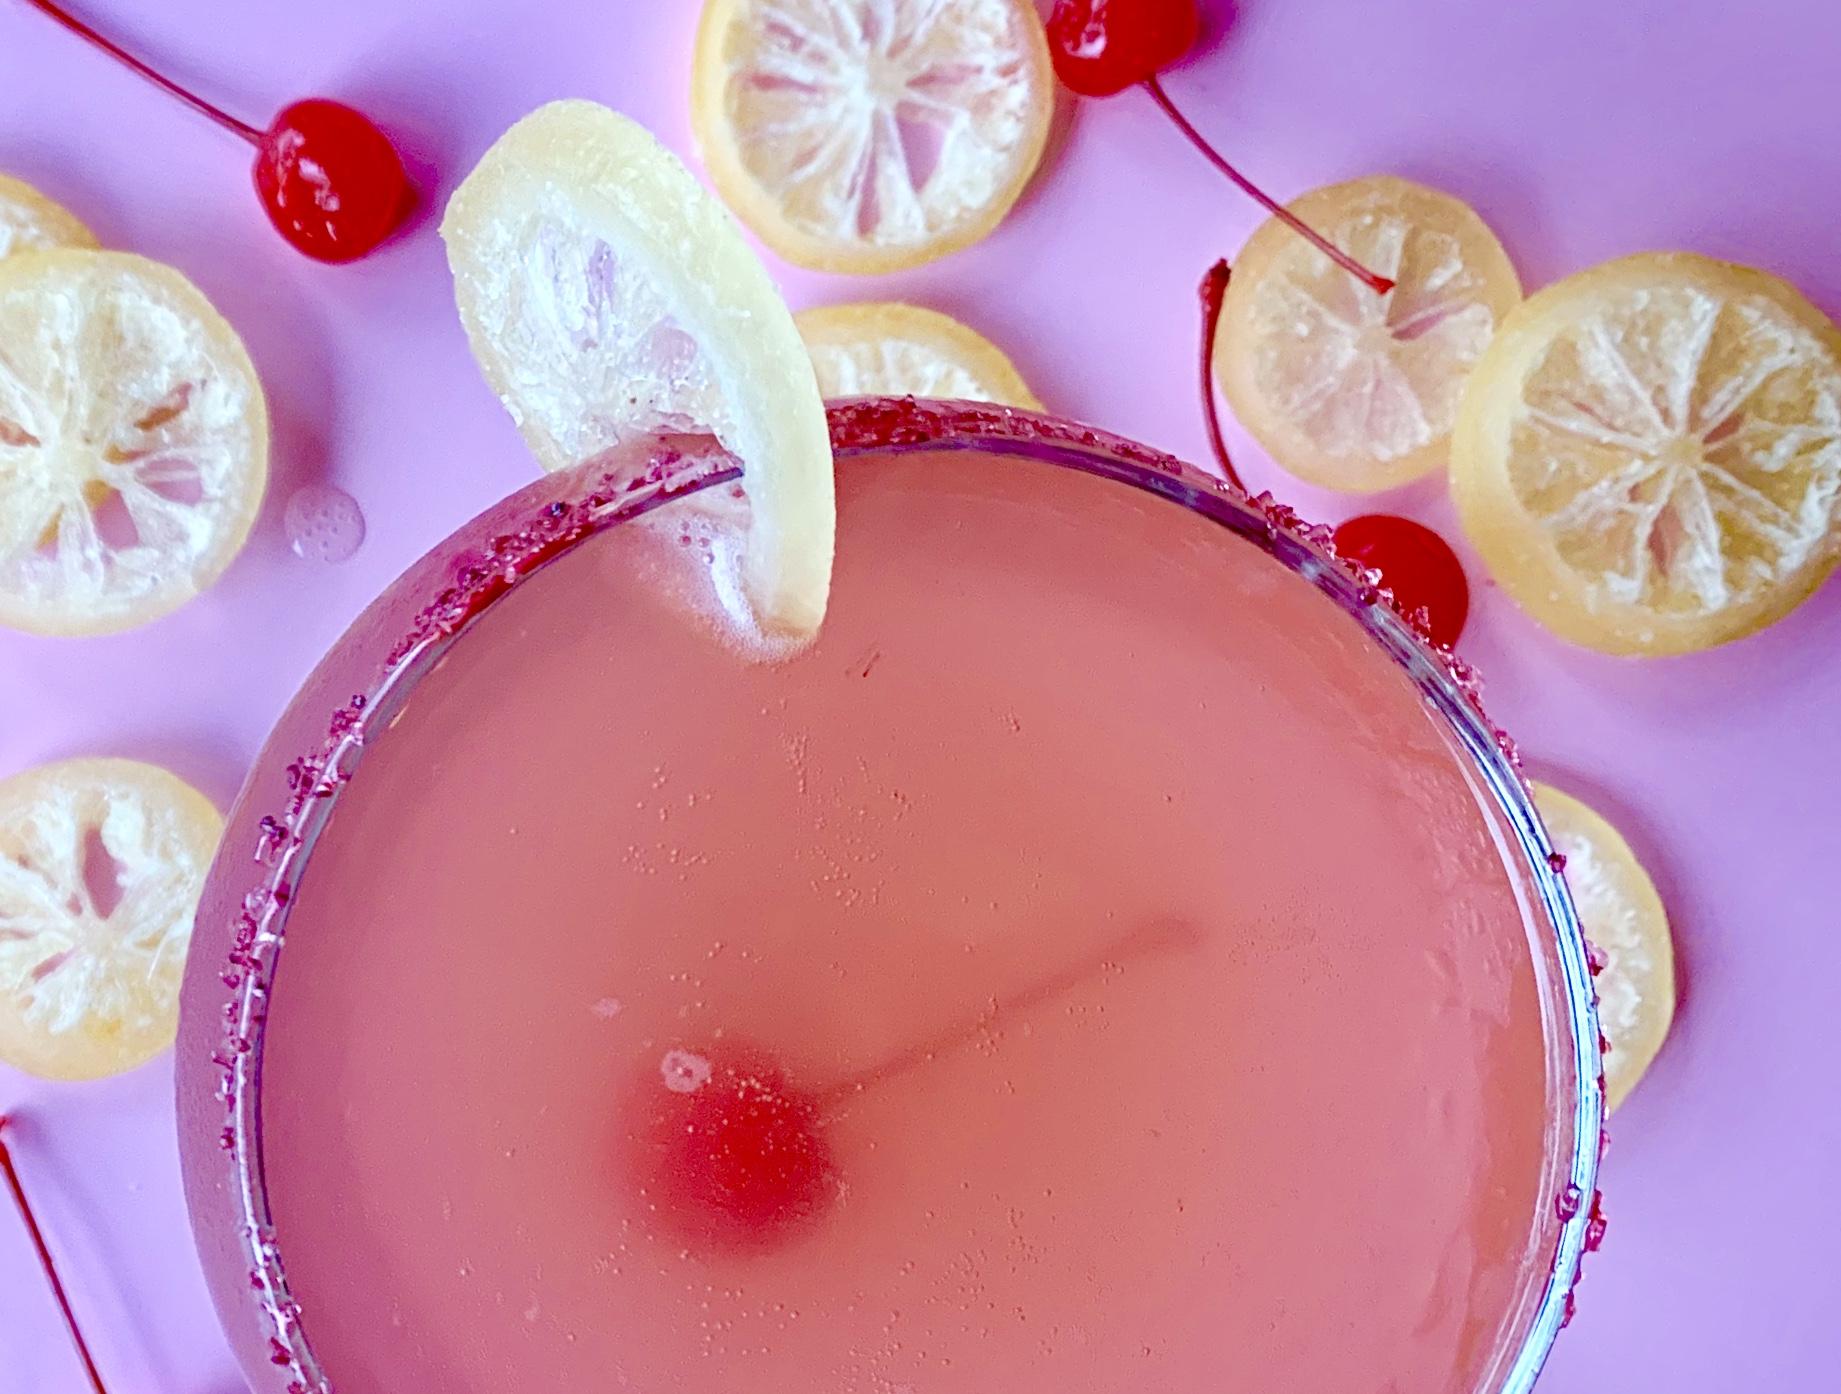 Codigo Tequila Drink Specials